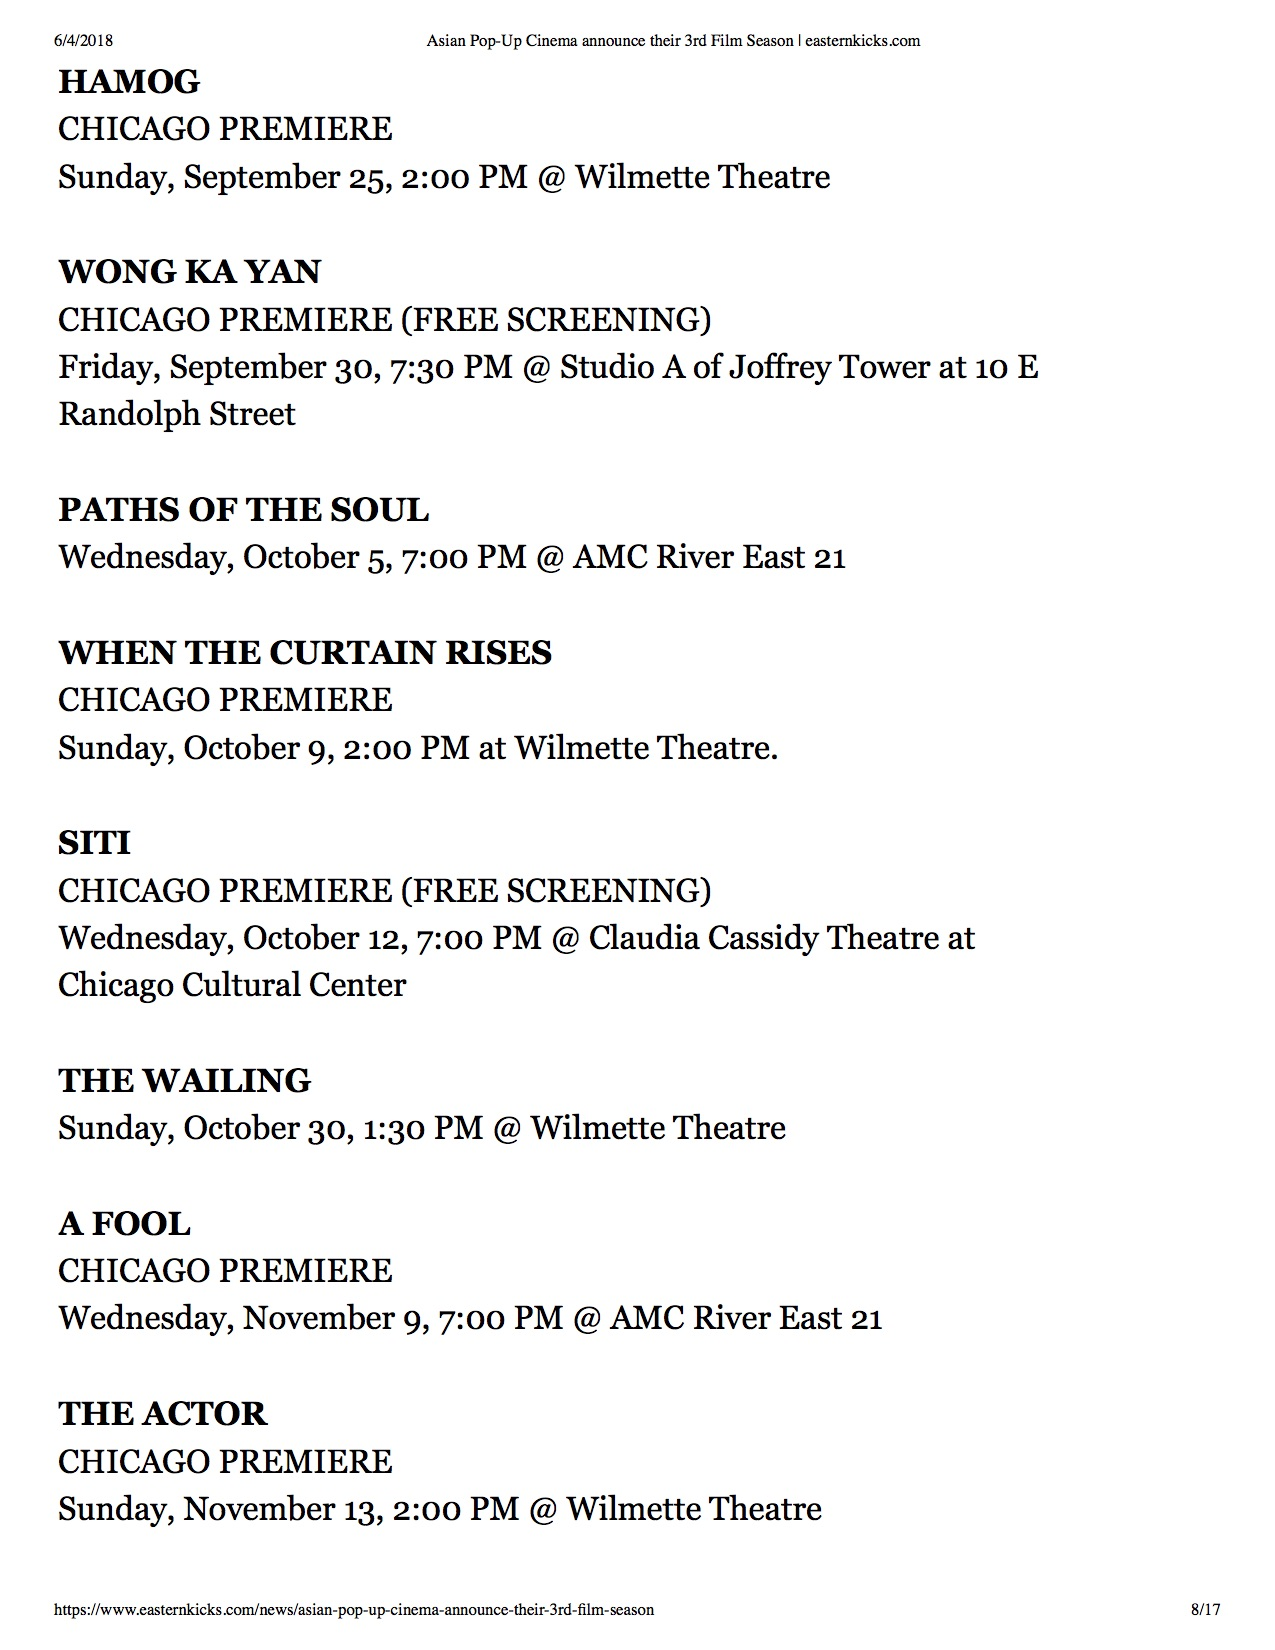 8Asian Pop-Up Cinema announce their 3rd Film Season _ easternkicks.jpg